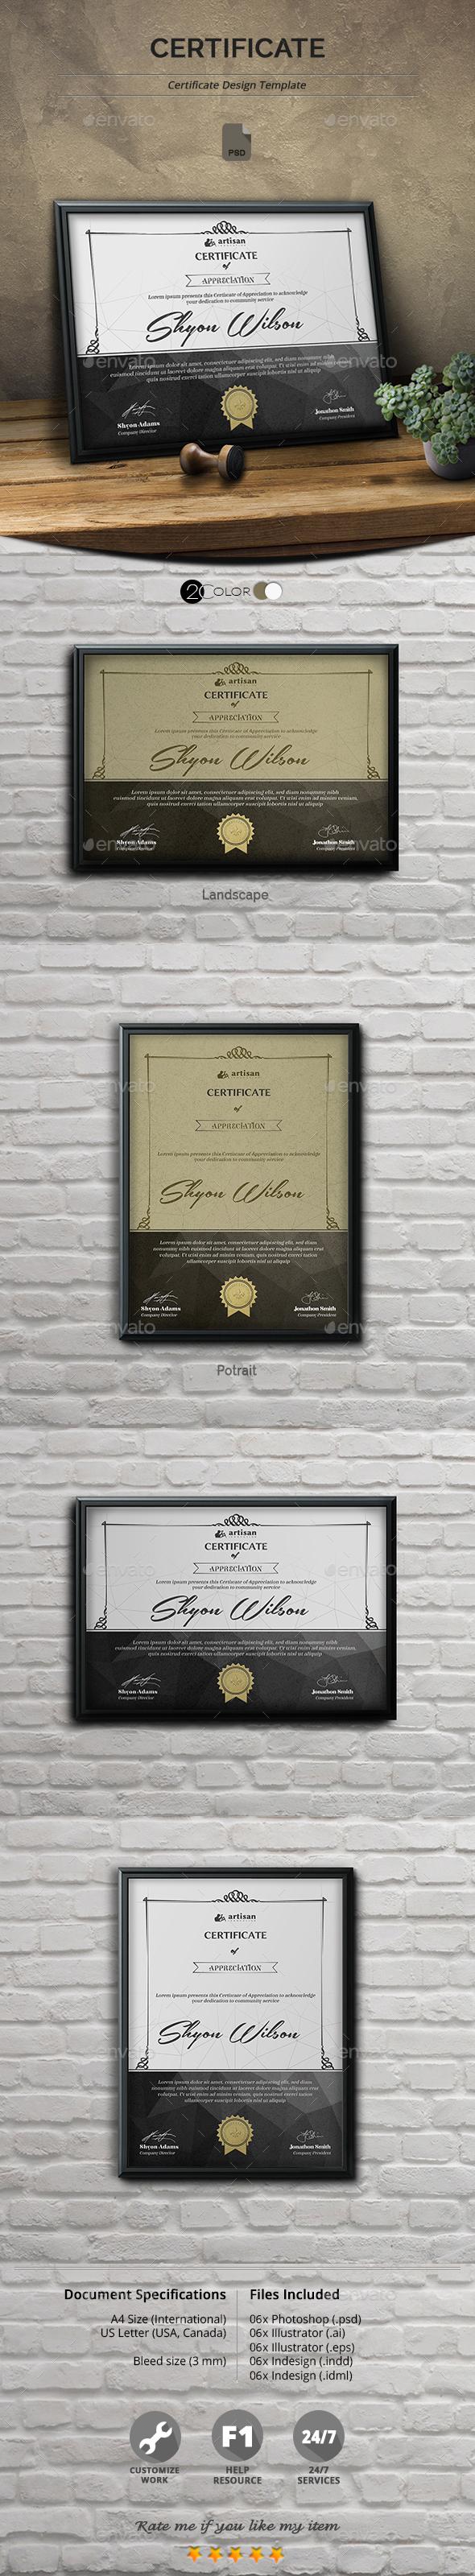 Certificate template psd resume templates pinterest certificate template psd yadclub Images